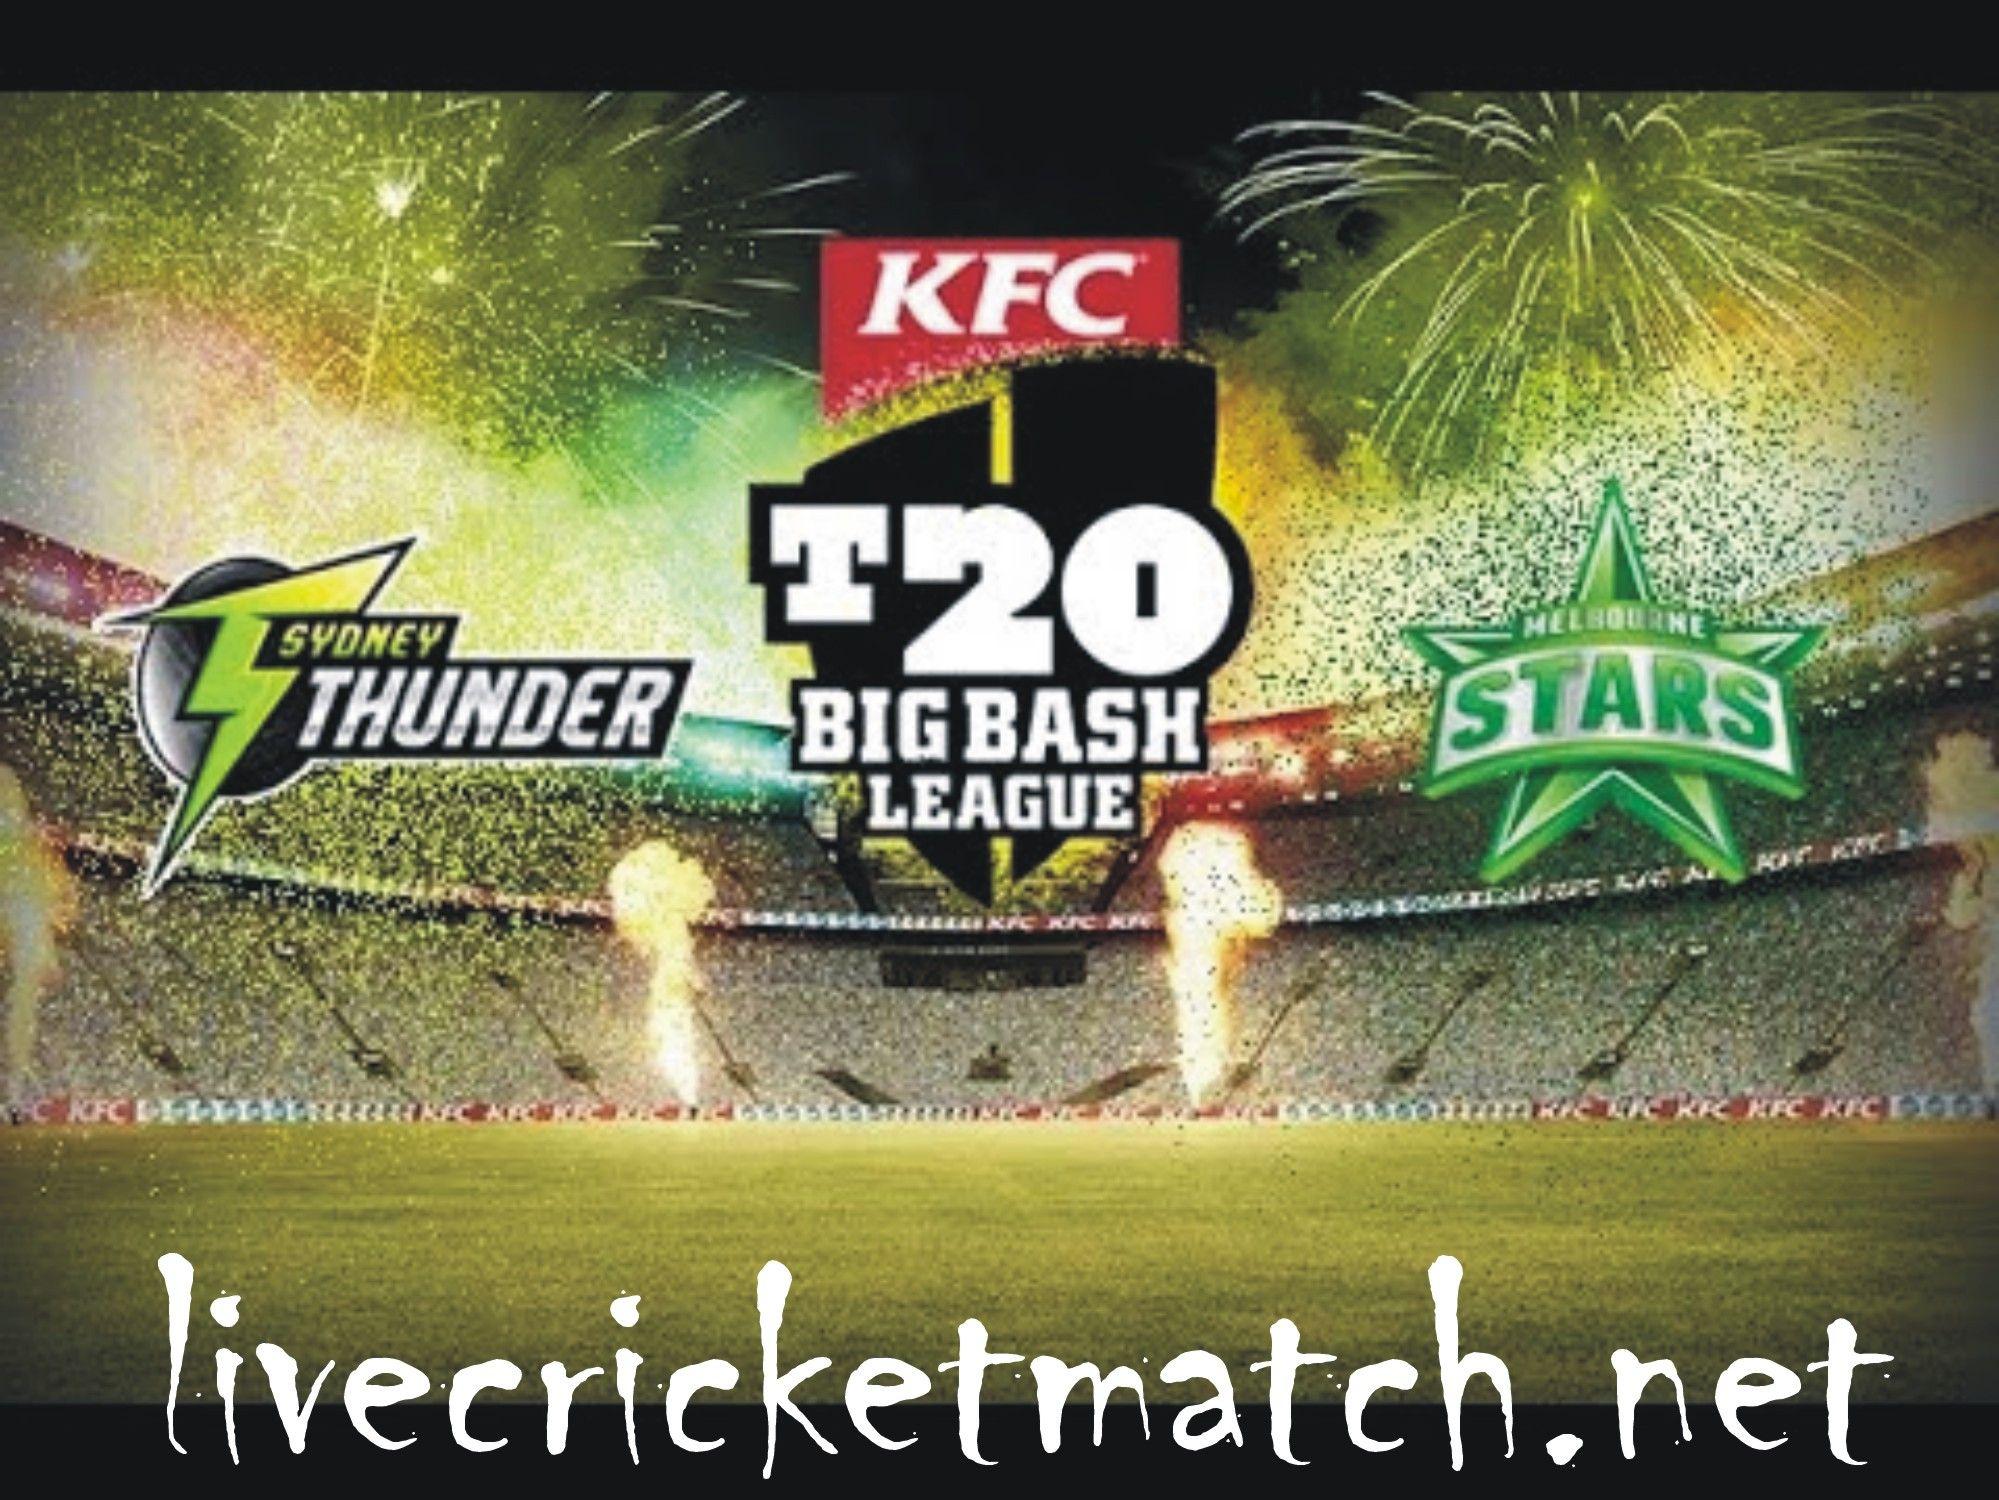 Bbl Melbourne Stars Vs Sydney Thunder 3rd Match Big Bash League Live Stream Sydney Thunder Melbourne Stars Live Match Streaming